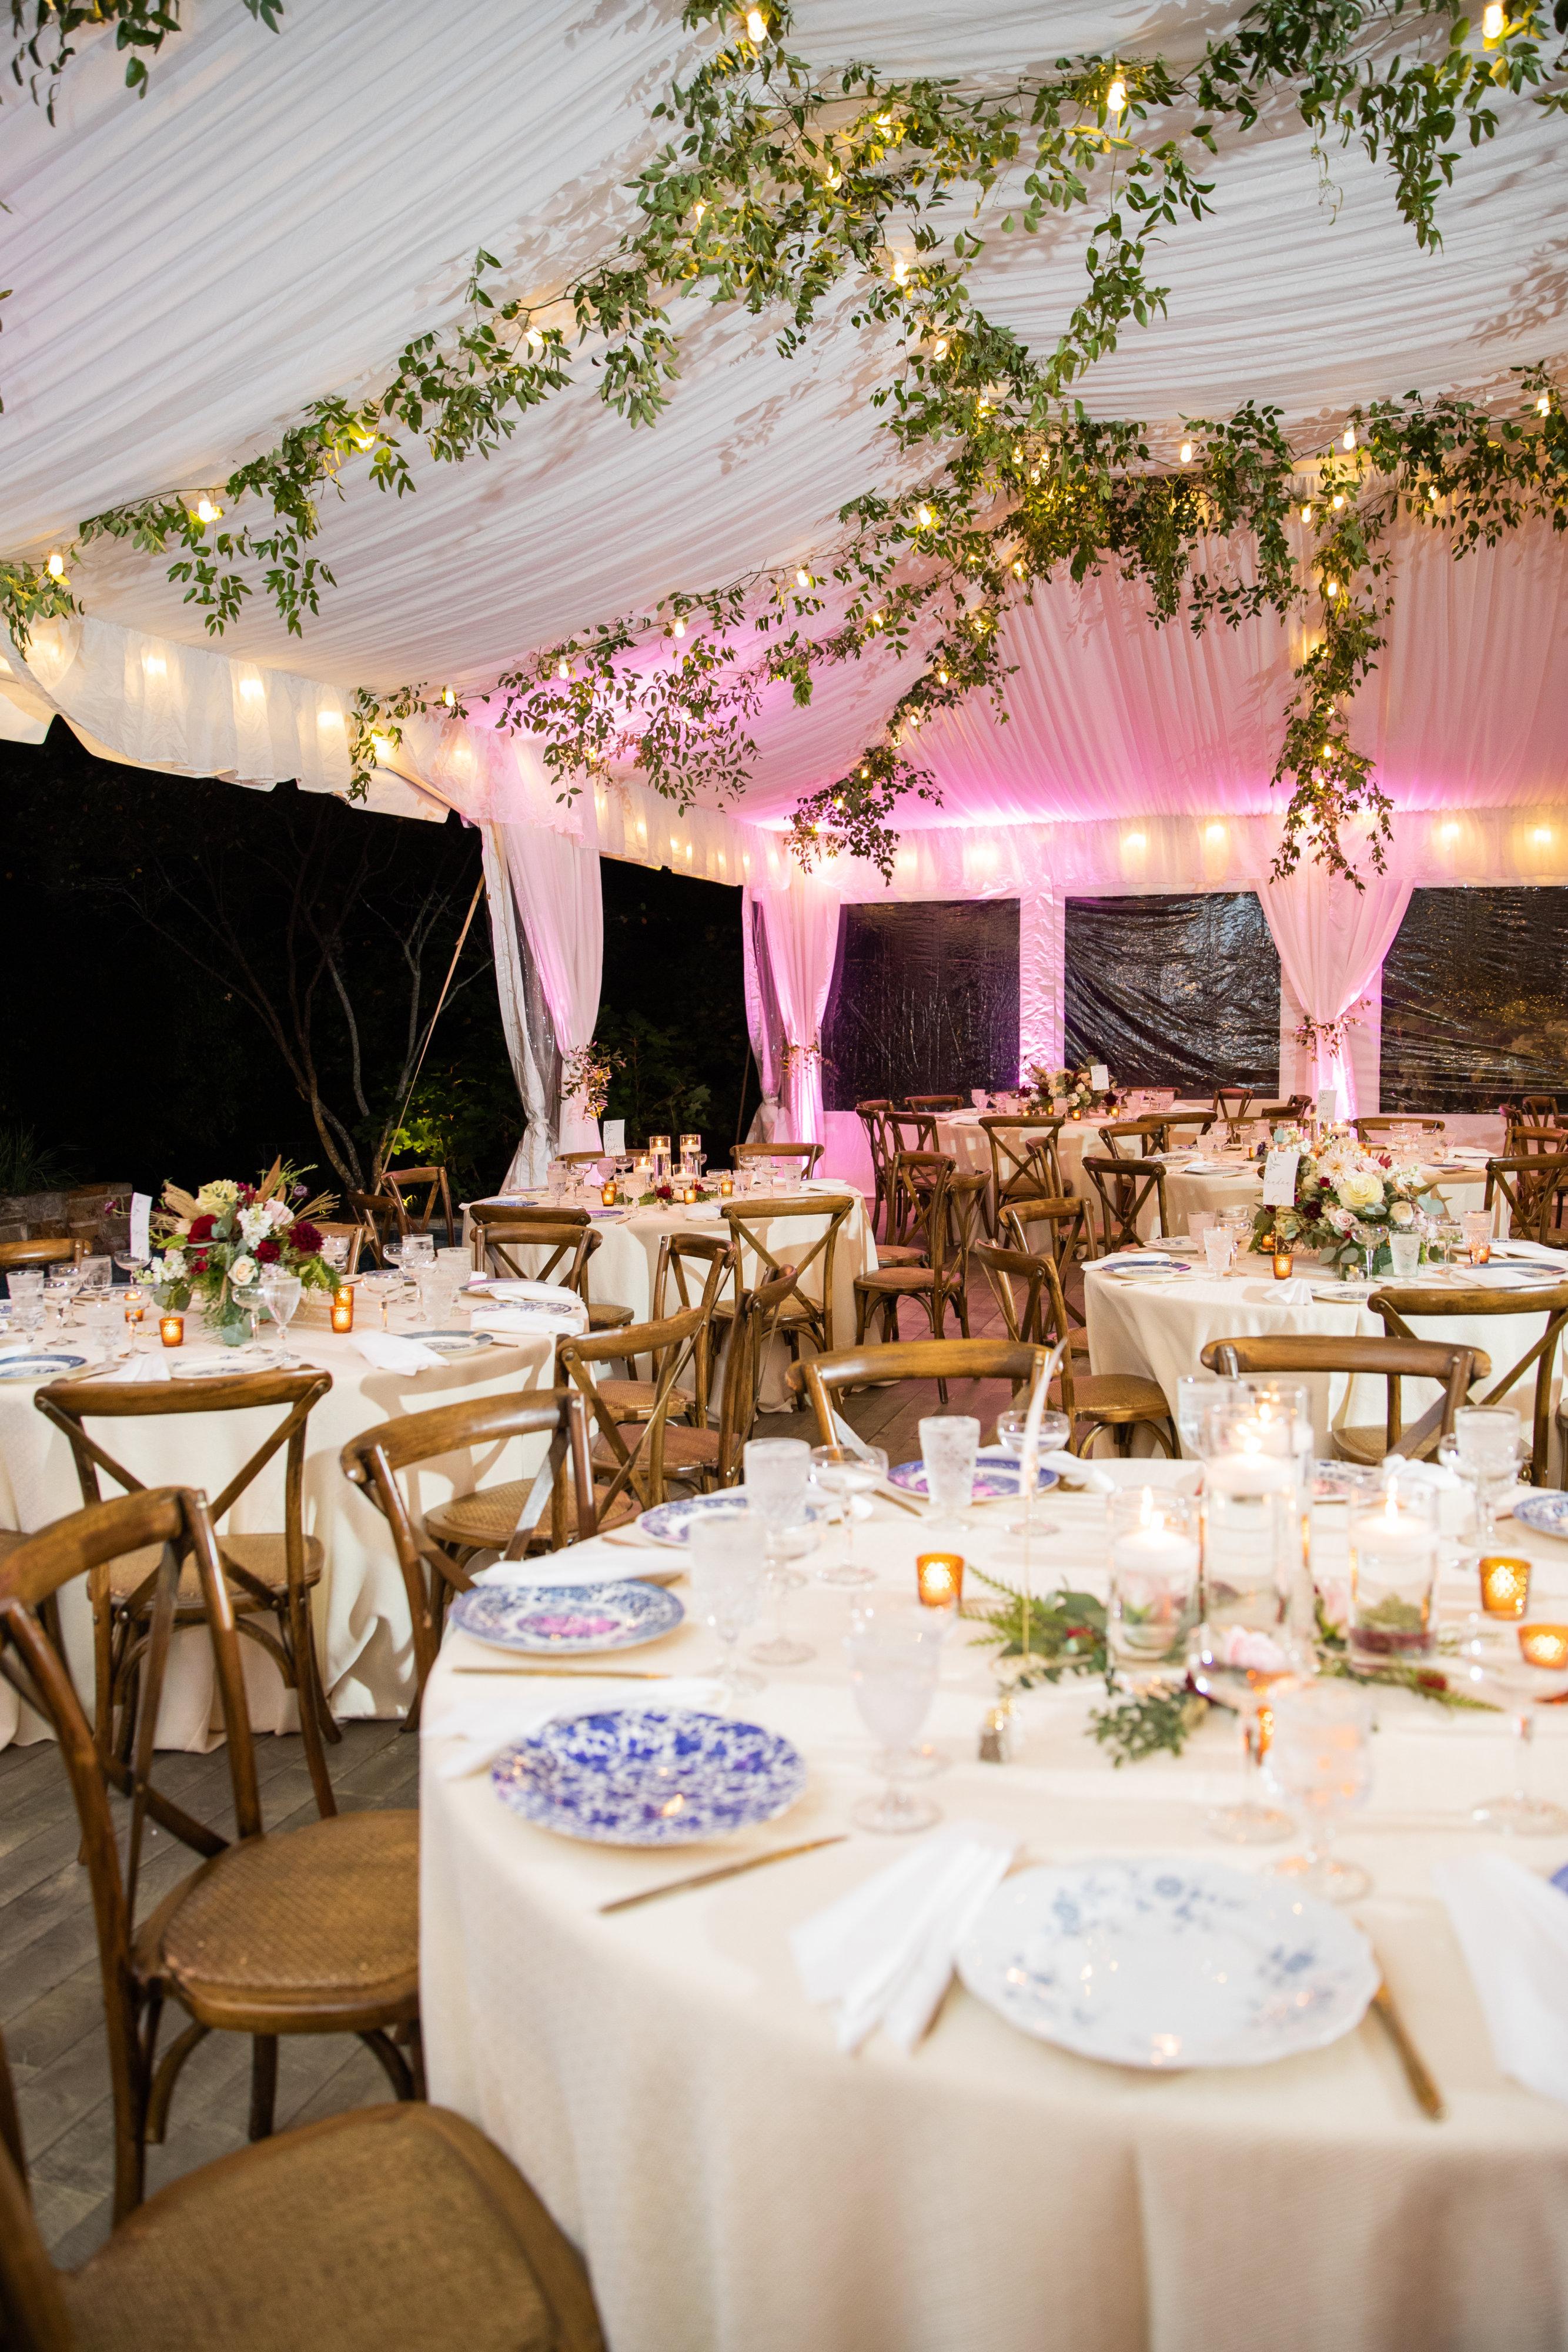 StefanieKamermanPhotography-MelanieandBenjamin-Wedding-Bethesda,MD-2019-10-12-351